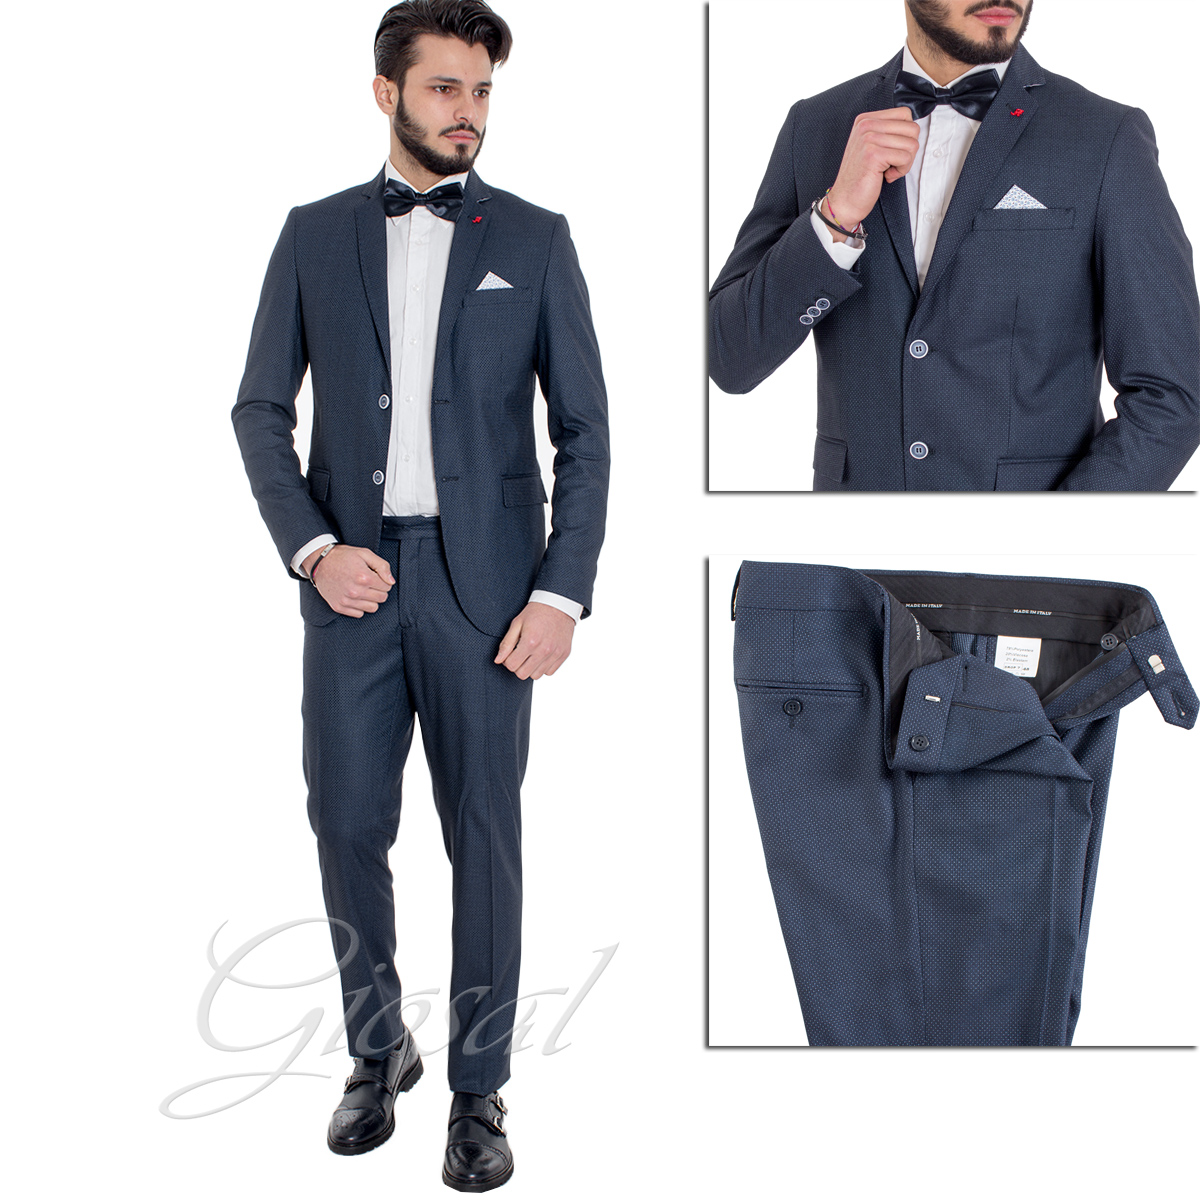 giacca elegante uomo blu notte a pois